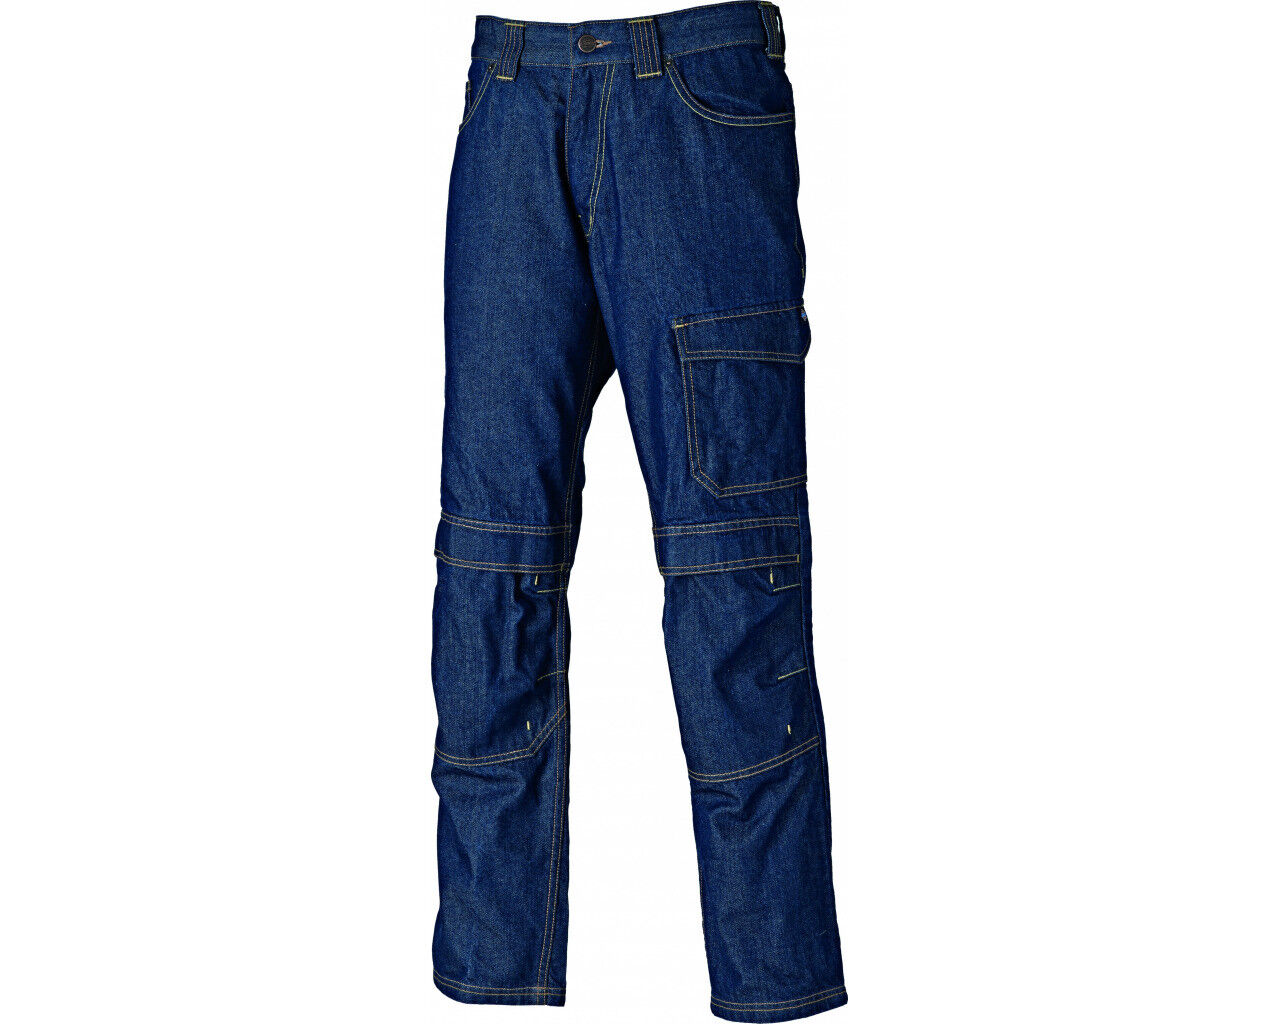 Dickies Stanmore lavoro Jeans DT1007 DT1007 DT1007 Da Uomo Premier Heavy Duty Pantaloni Multi Tasca 73c22a